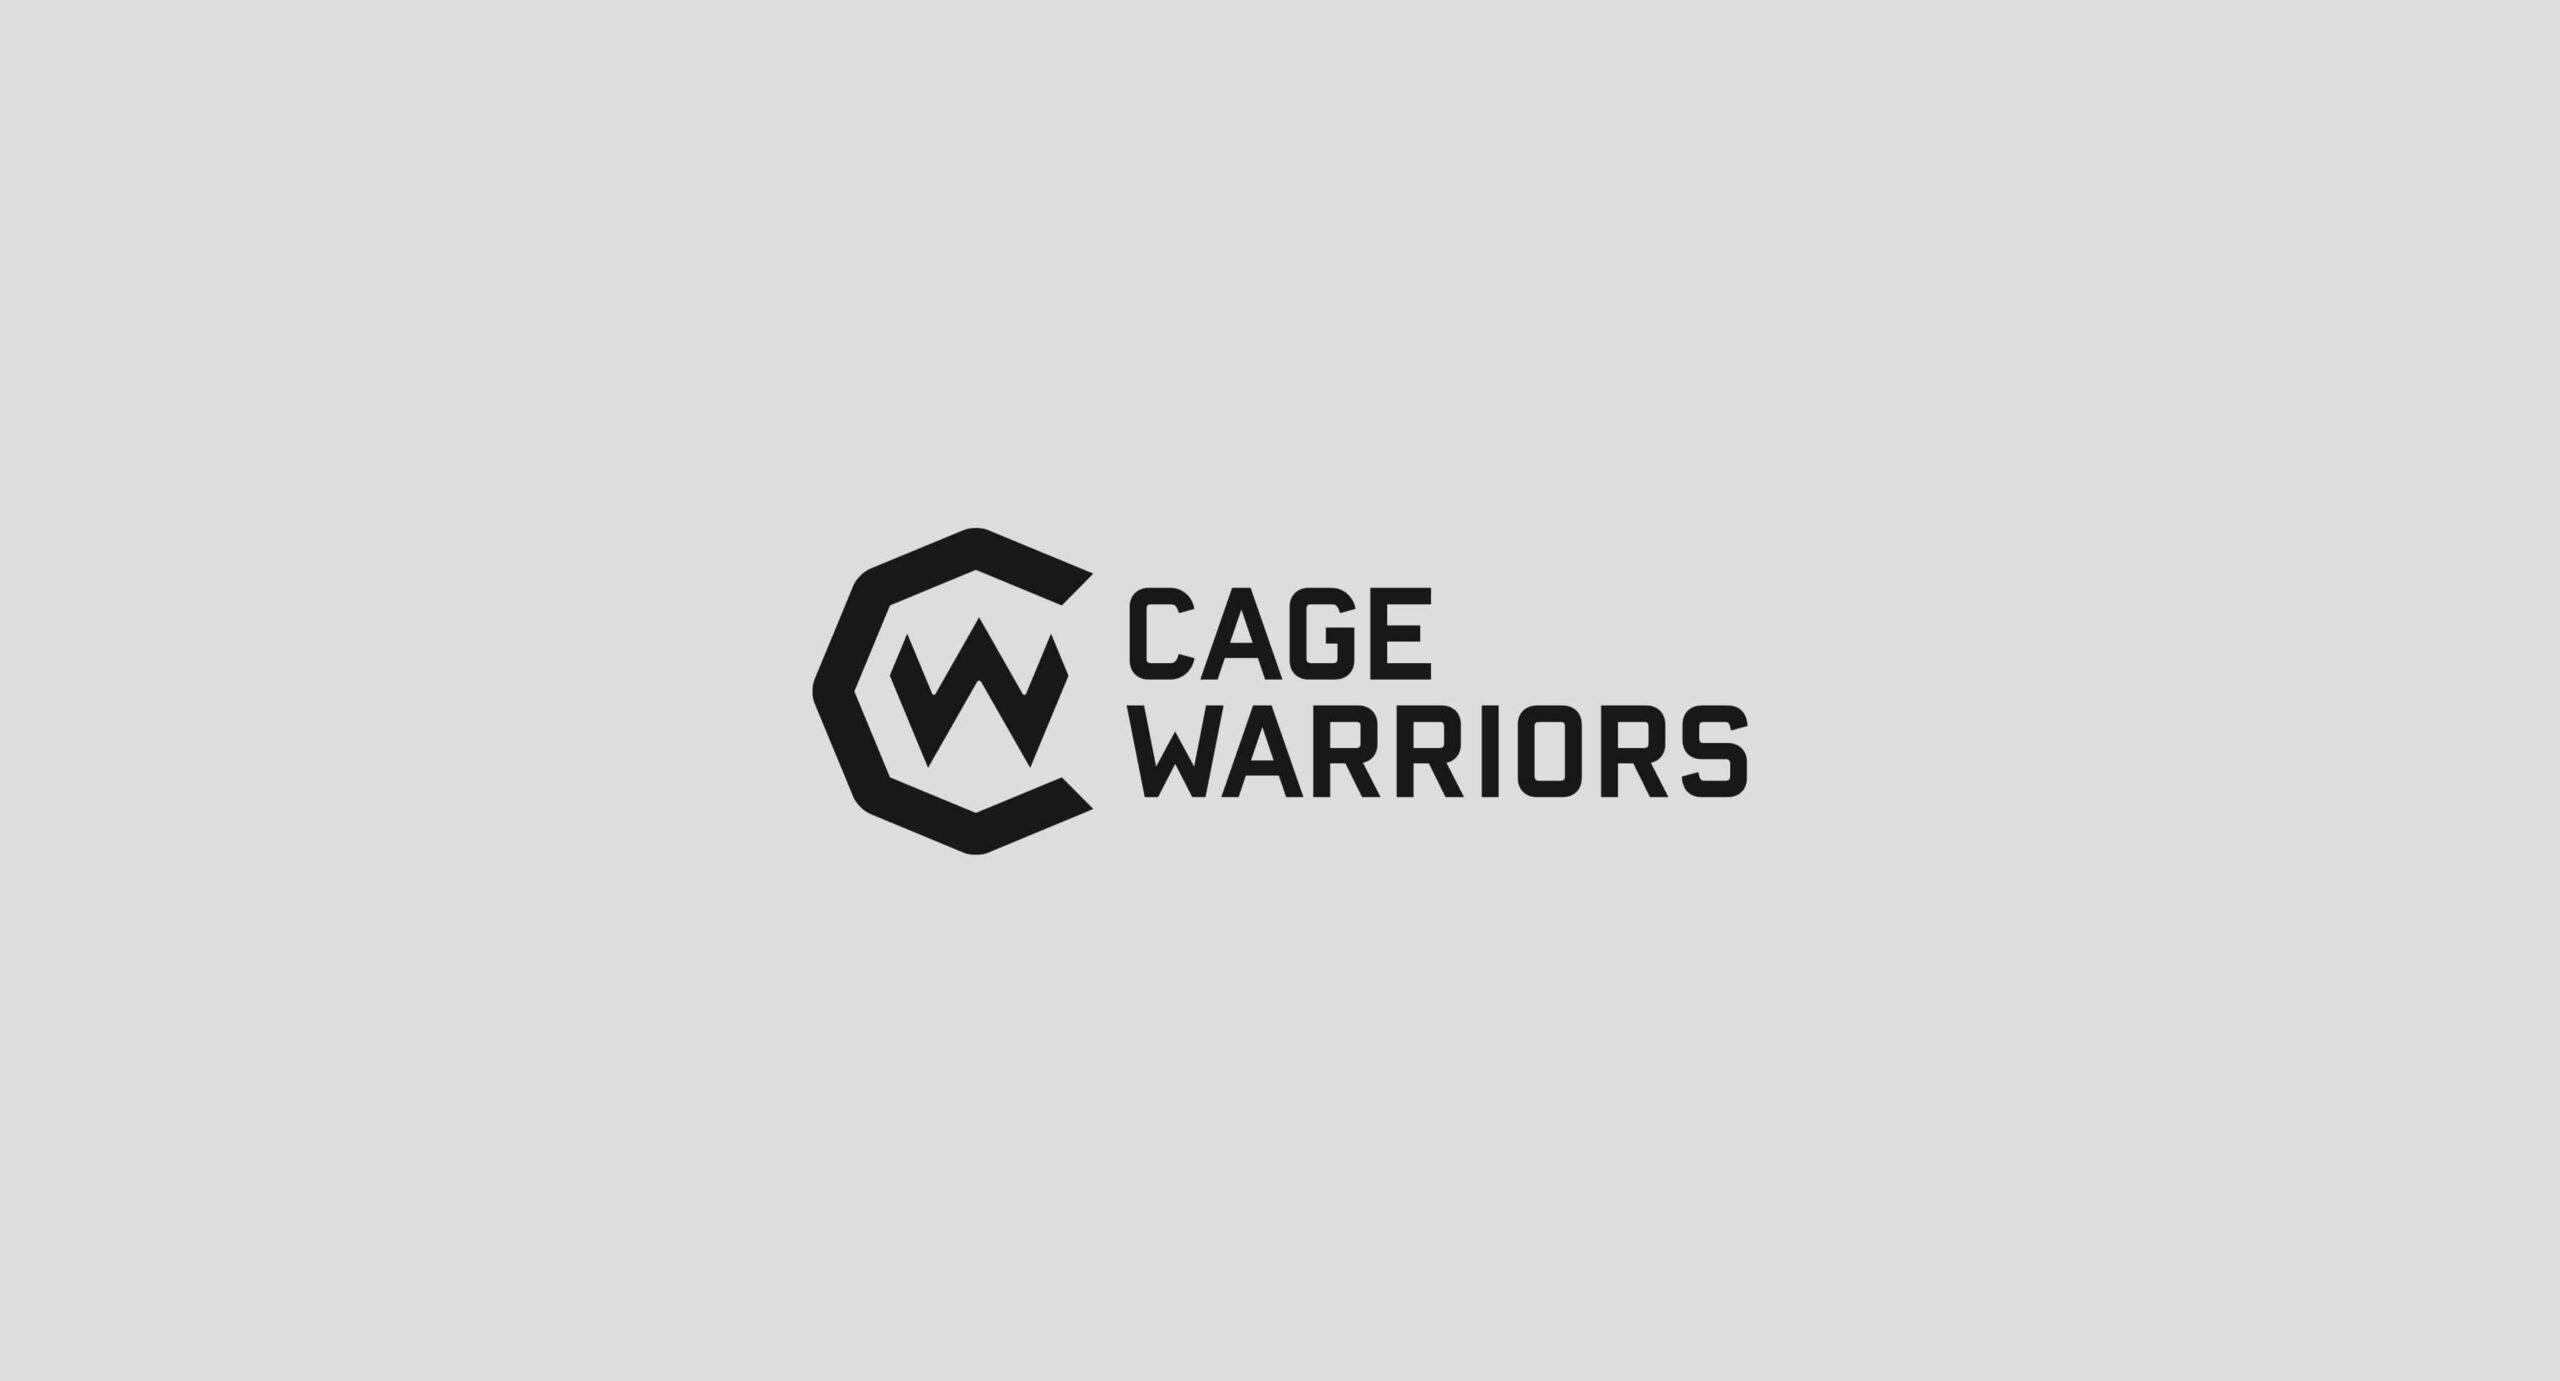 05_Cage Warriors